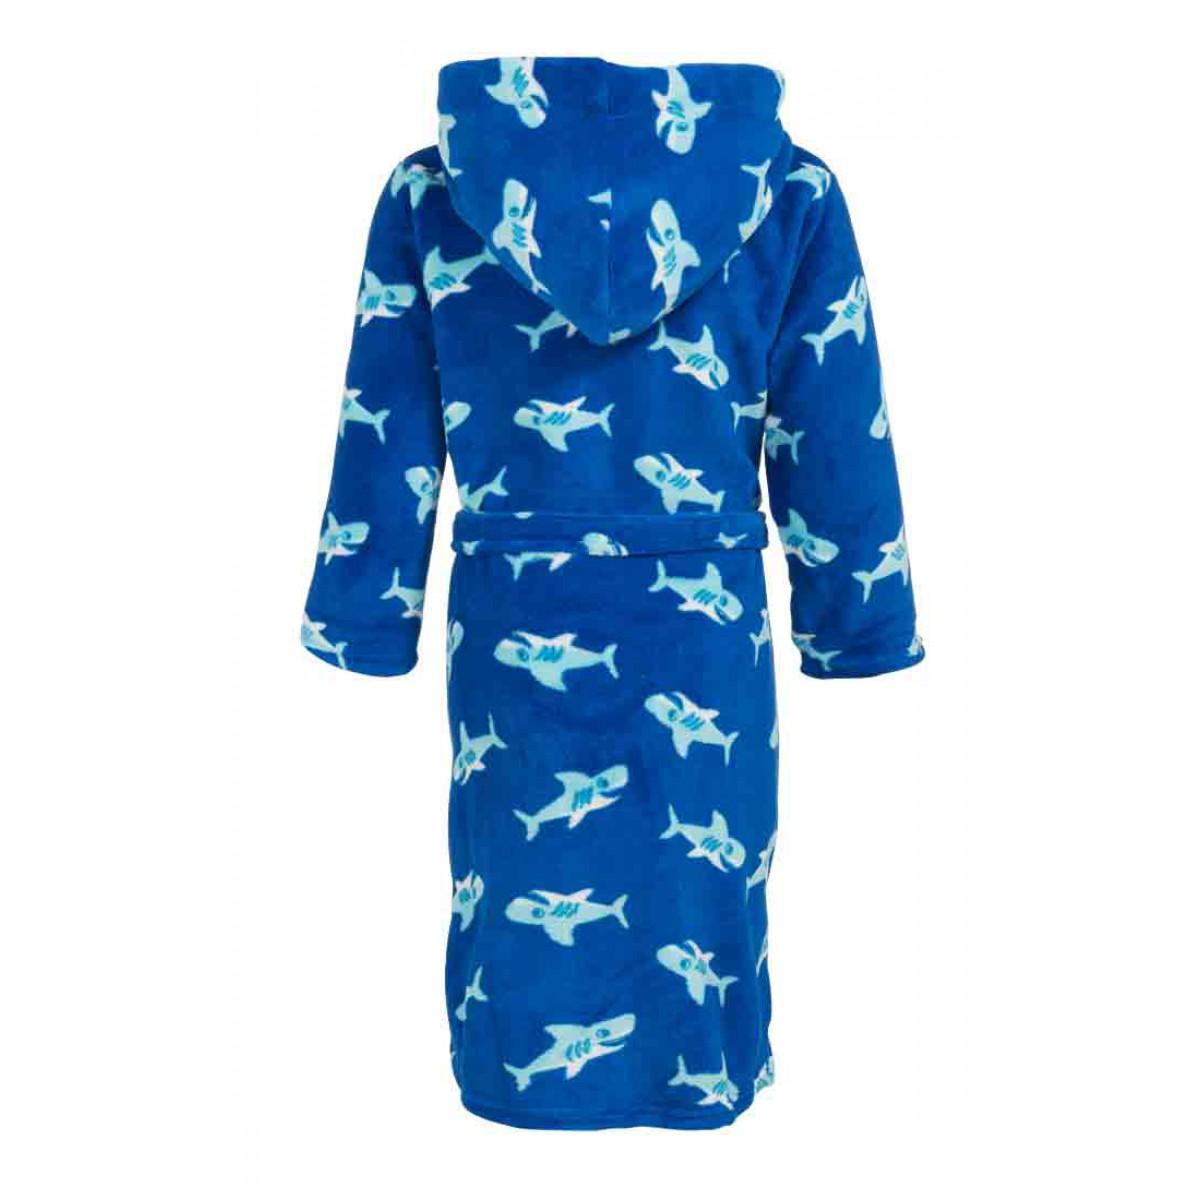 kinder badjas met haaien